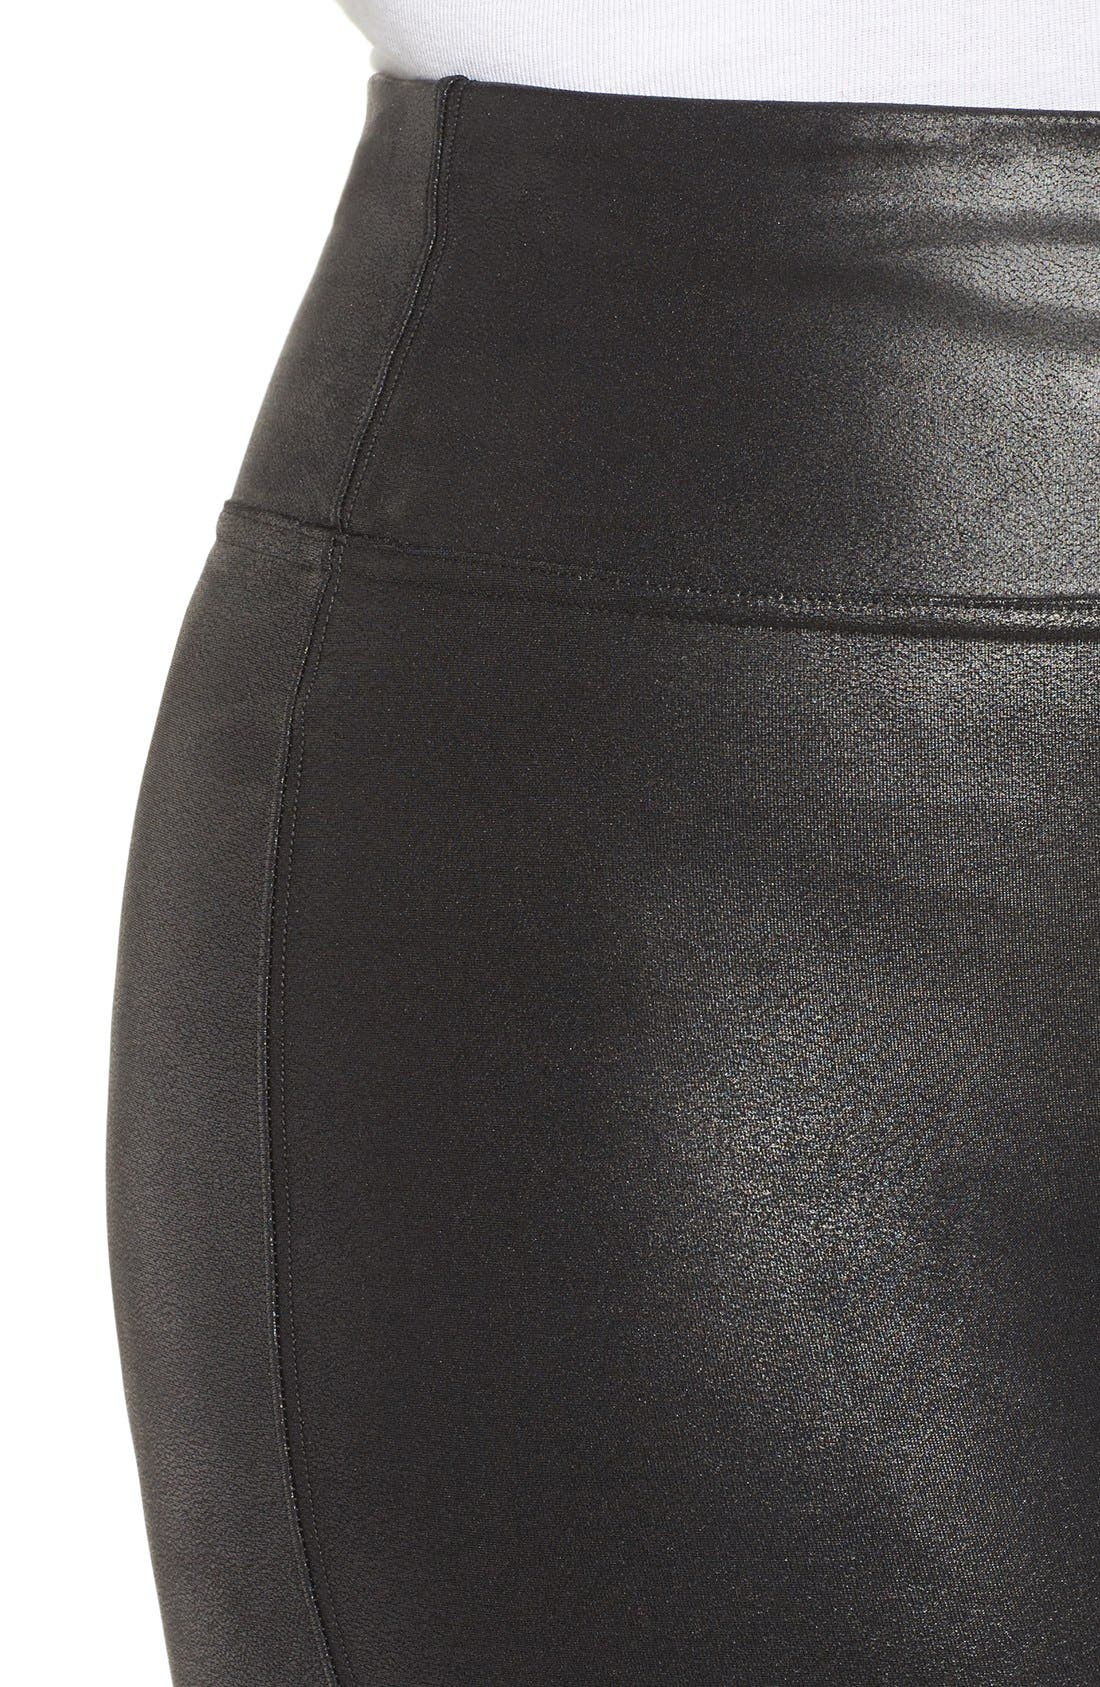 Faux Leather Leggings,                             Alternate thumbnail 8, color,                             BLACK